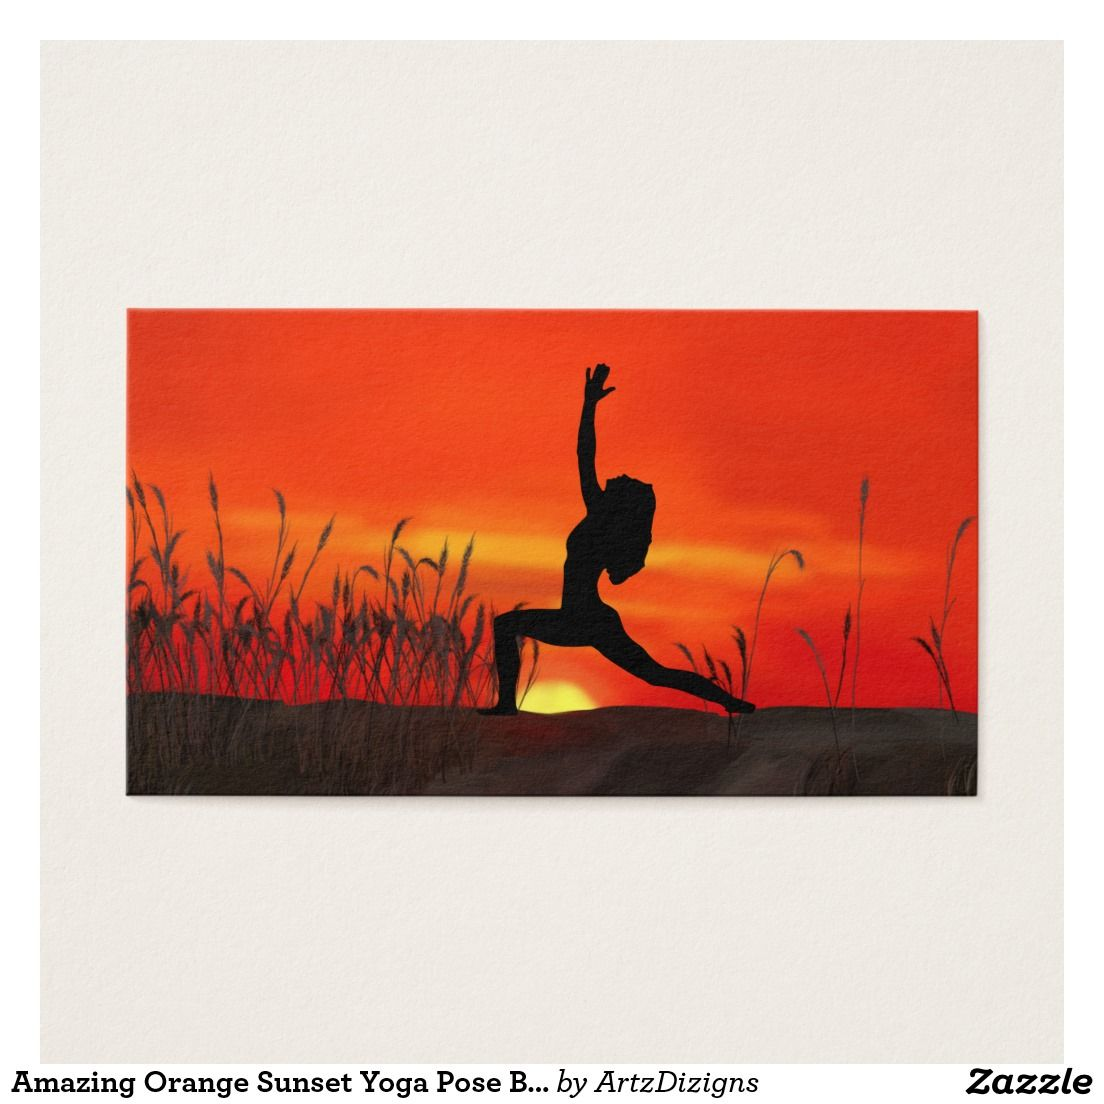 Amazing orange sunset yoga pose business cards yoga poses amazing orange sunset yoga pose business cards reheart Image collections